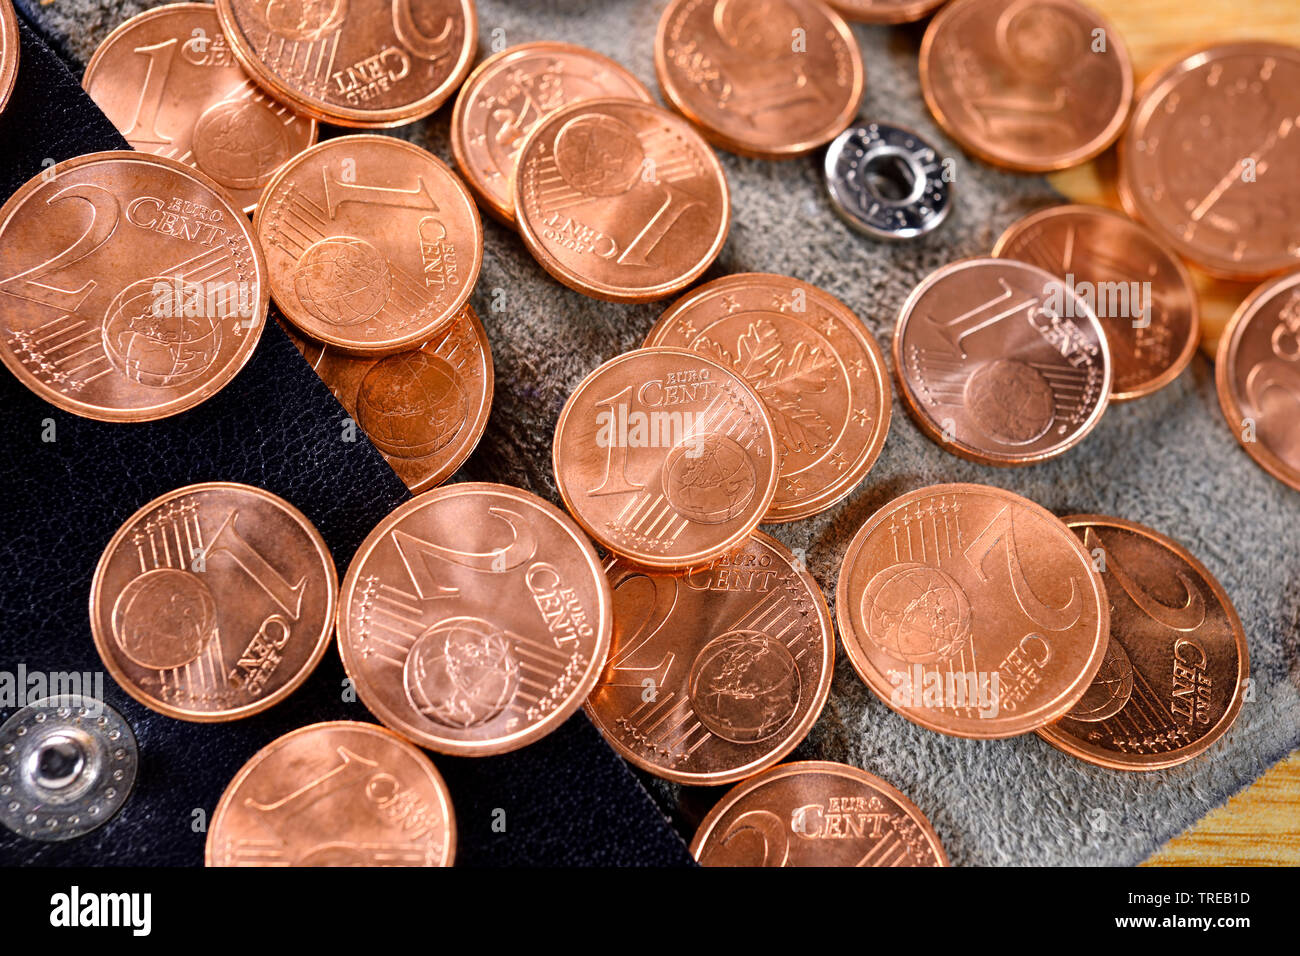 1- und 2-Centmuenzen - Diskussion ueber Abschaffung von Kleingeld   1 and 2 Cent coins - discussion about abolishing of coppers   BLWS521787.jpg [ (c) - Stock Image